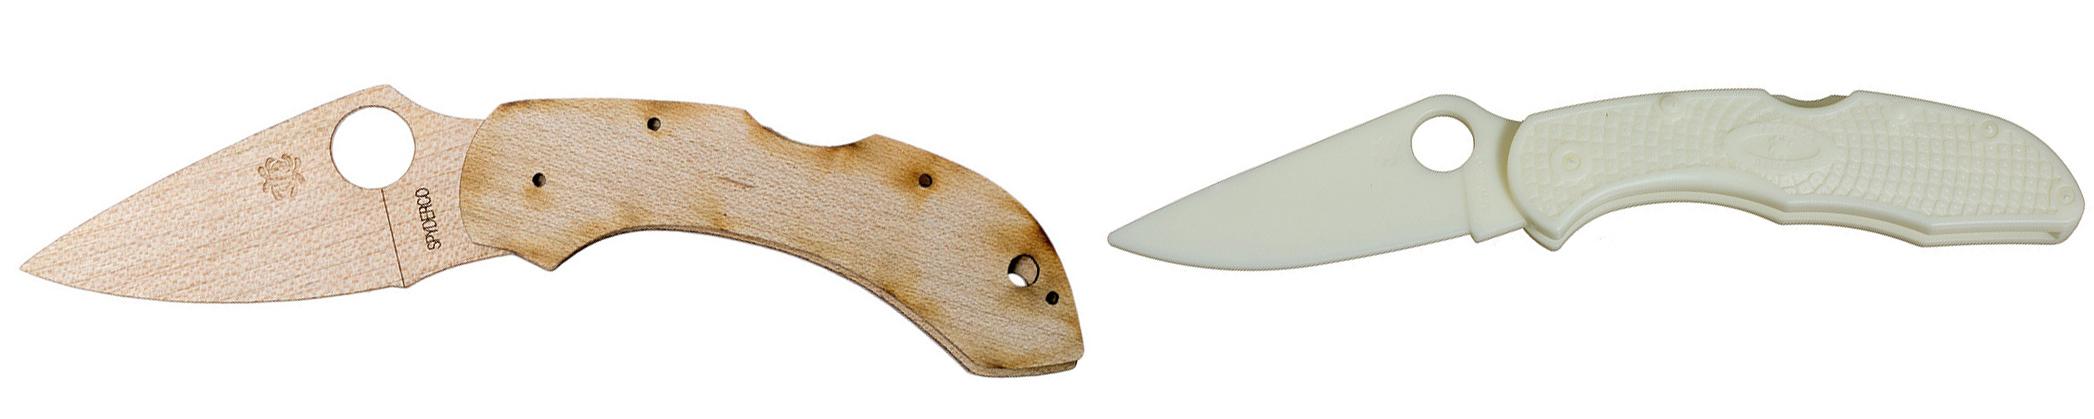 Spyderco Dragonfly и Spyderco Plastic kit Delica 4